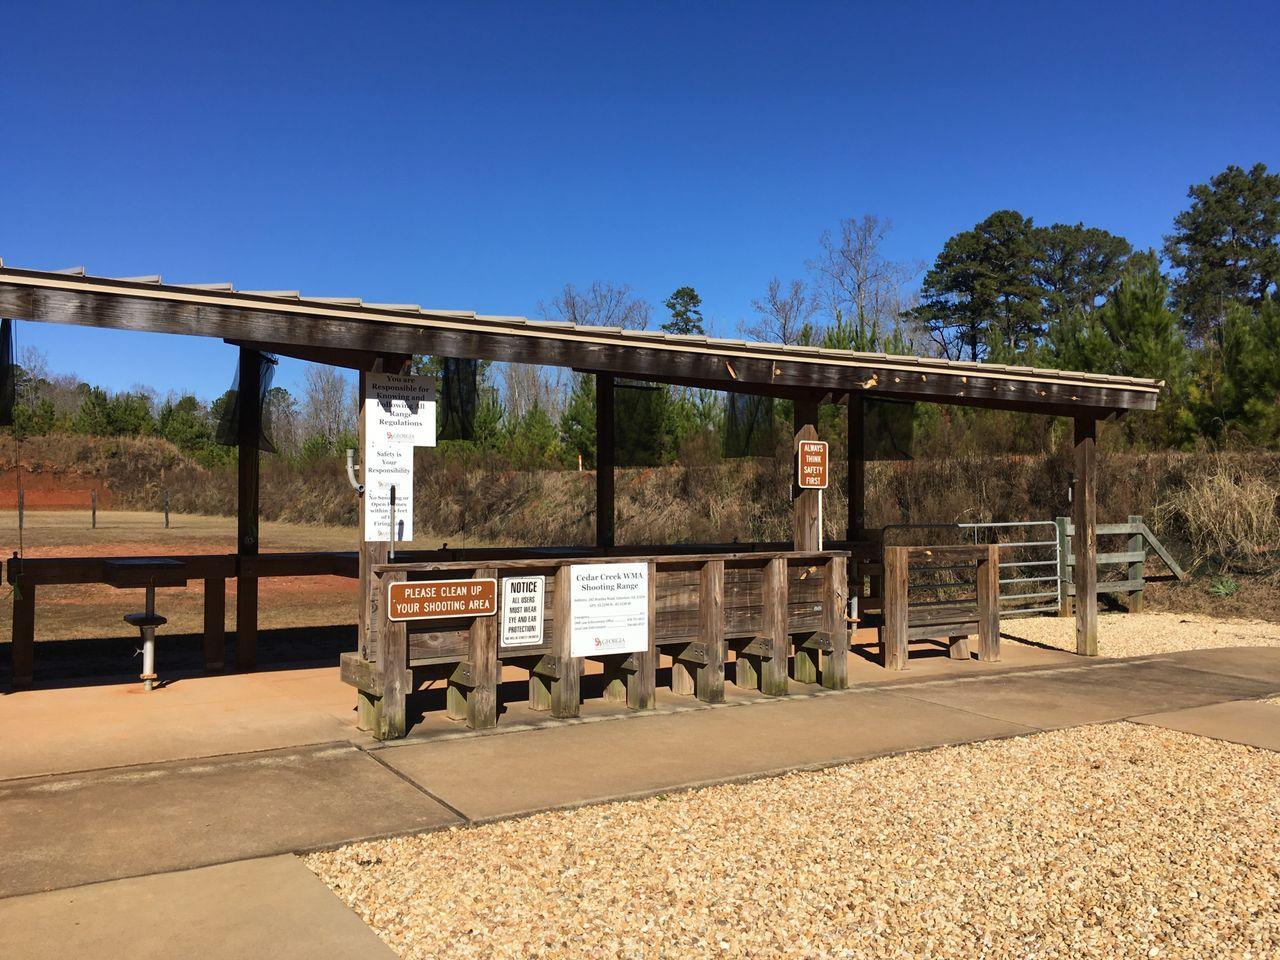 A quiet day at the Cedar Creek Shooting Range, Eatonton, Georgia, in January 2019.